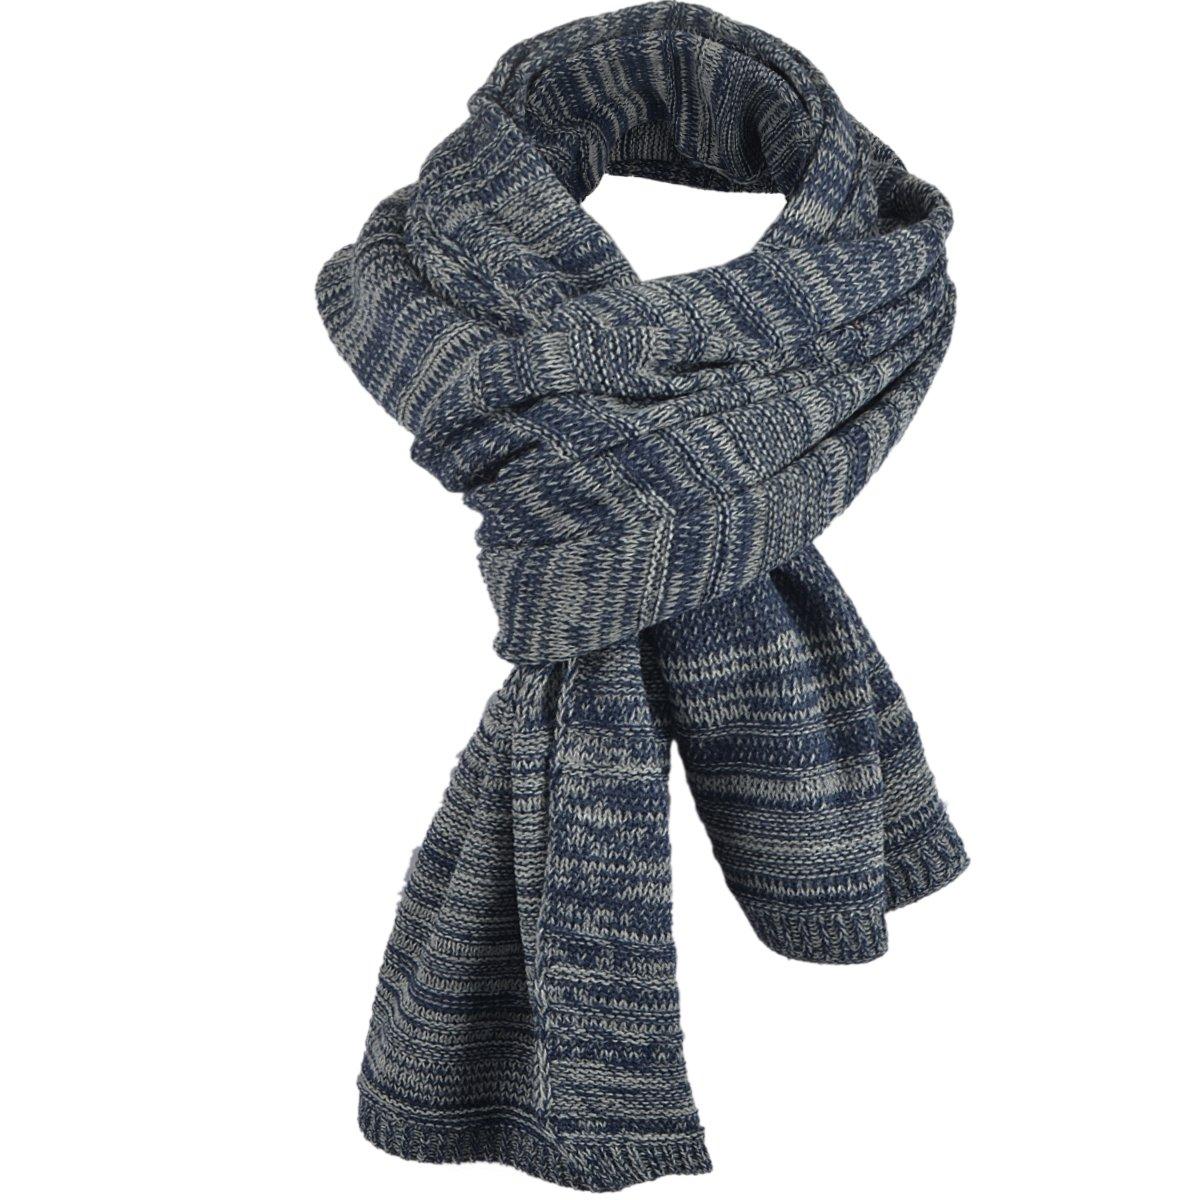 Classic Men Women Two-tone Knit Winter Scarf Oversize E5001 (Navy)